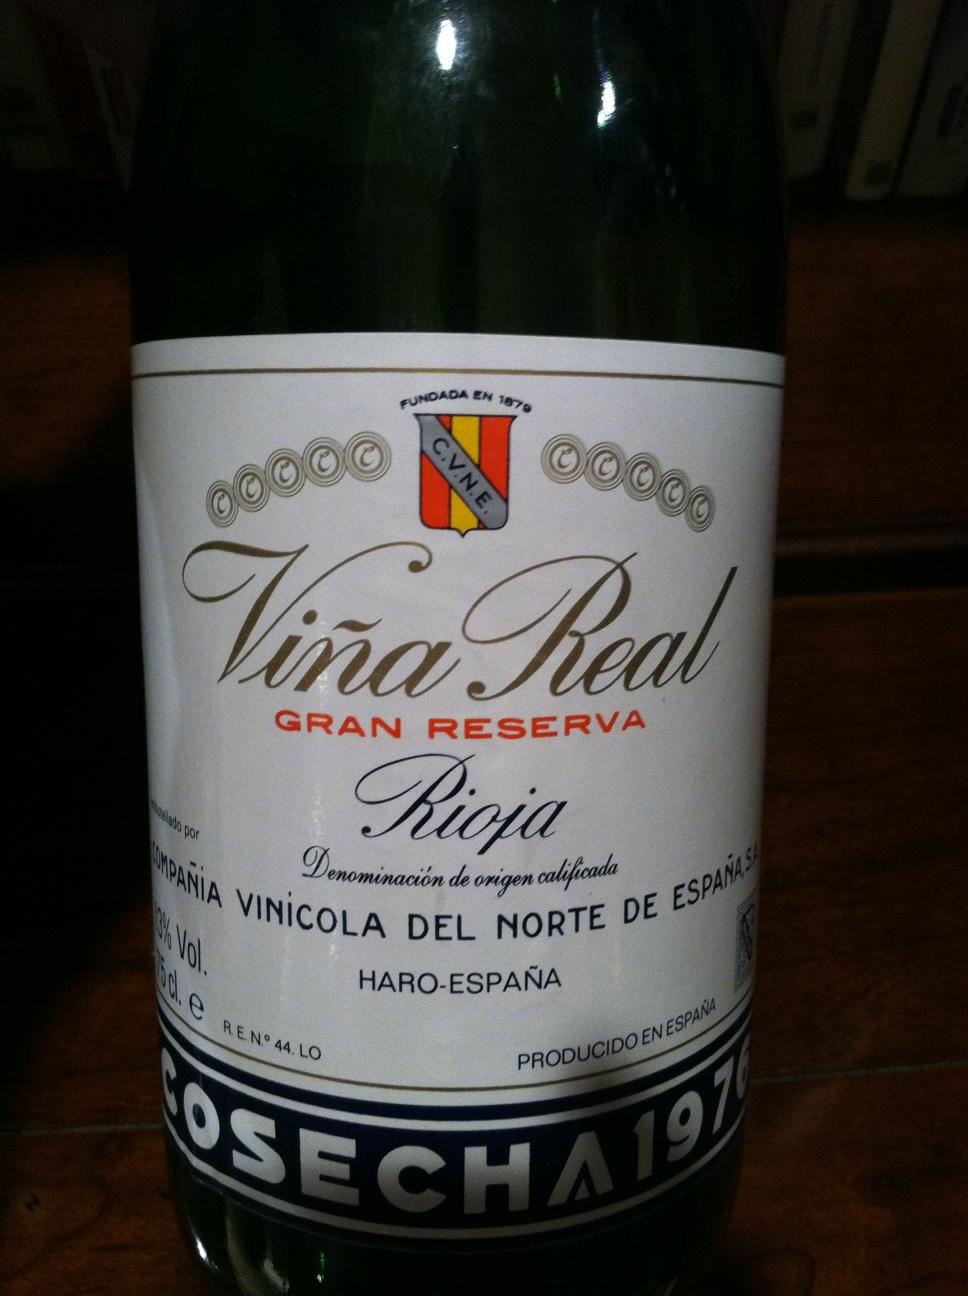 Vinicola consolidating